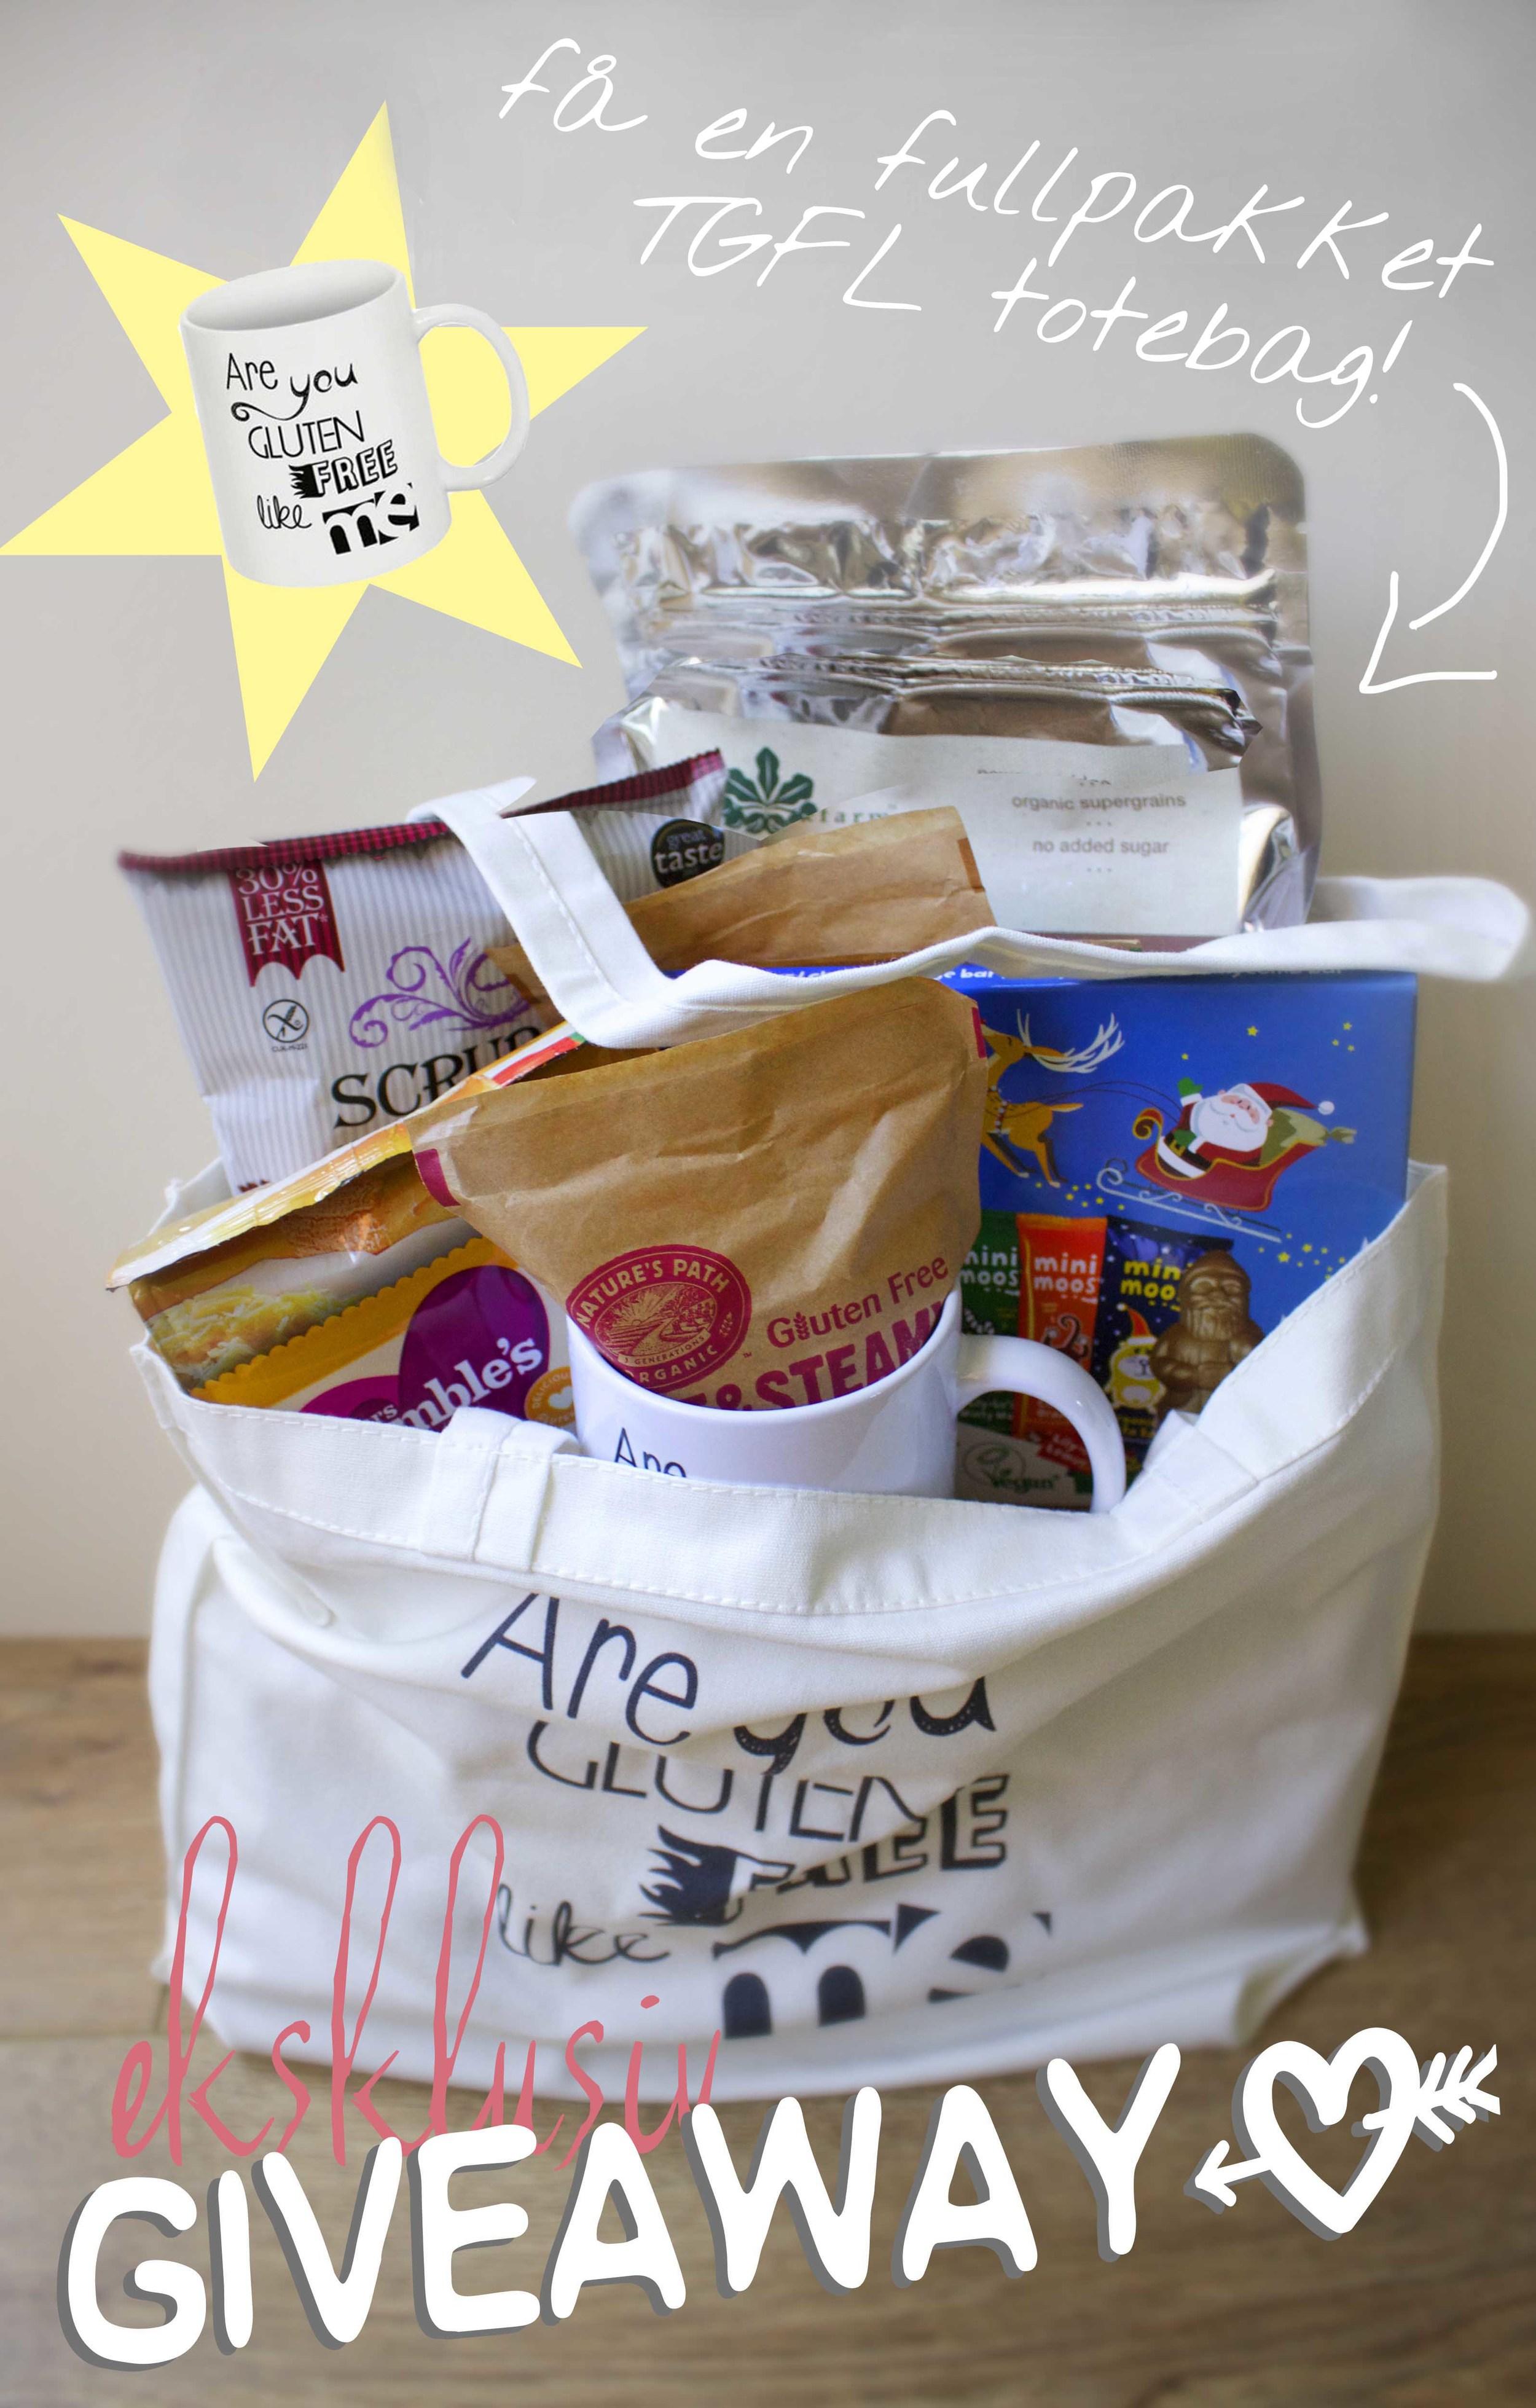 glutenfri giveaway på The Gluten Free Lifesaver